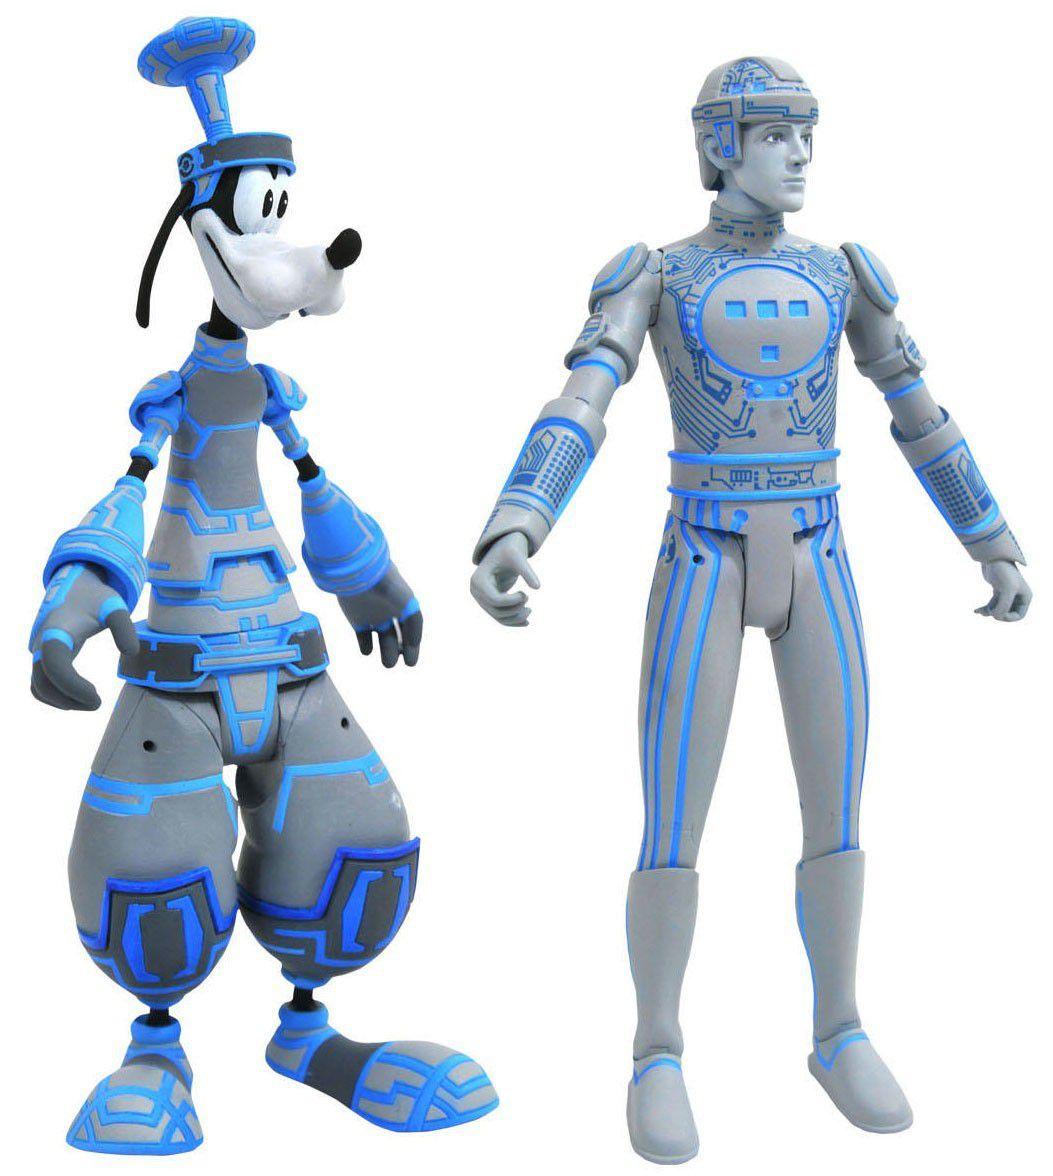 Action Figure Pateta & Tron (Goofy & Tron): Kingdom Hearts (Series 3) Boneco Colecionável - Diamond Select